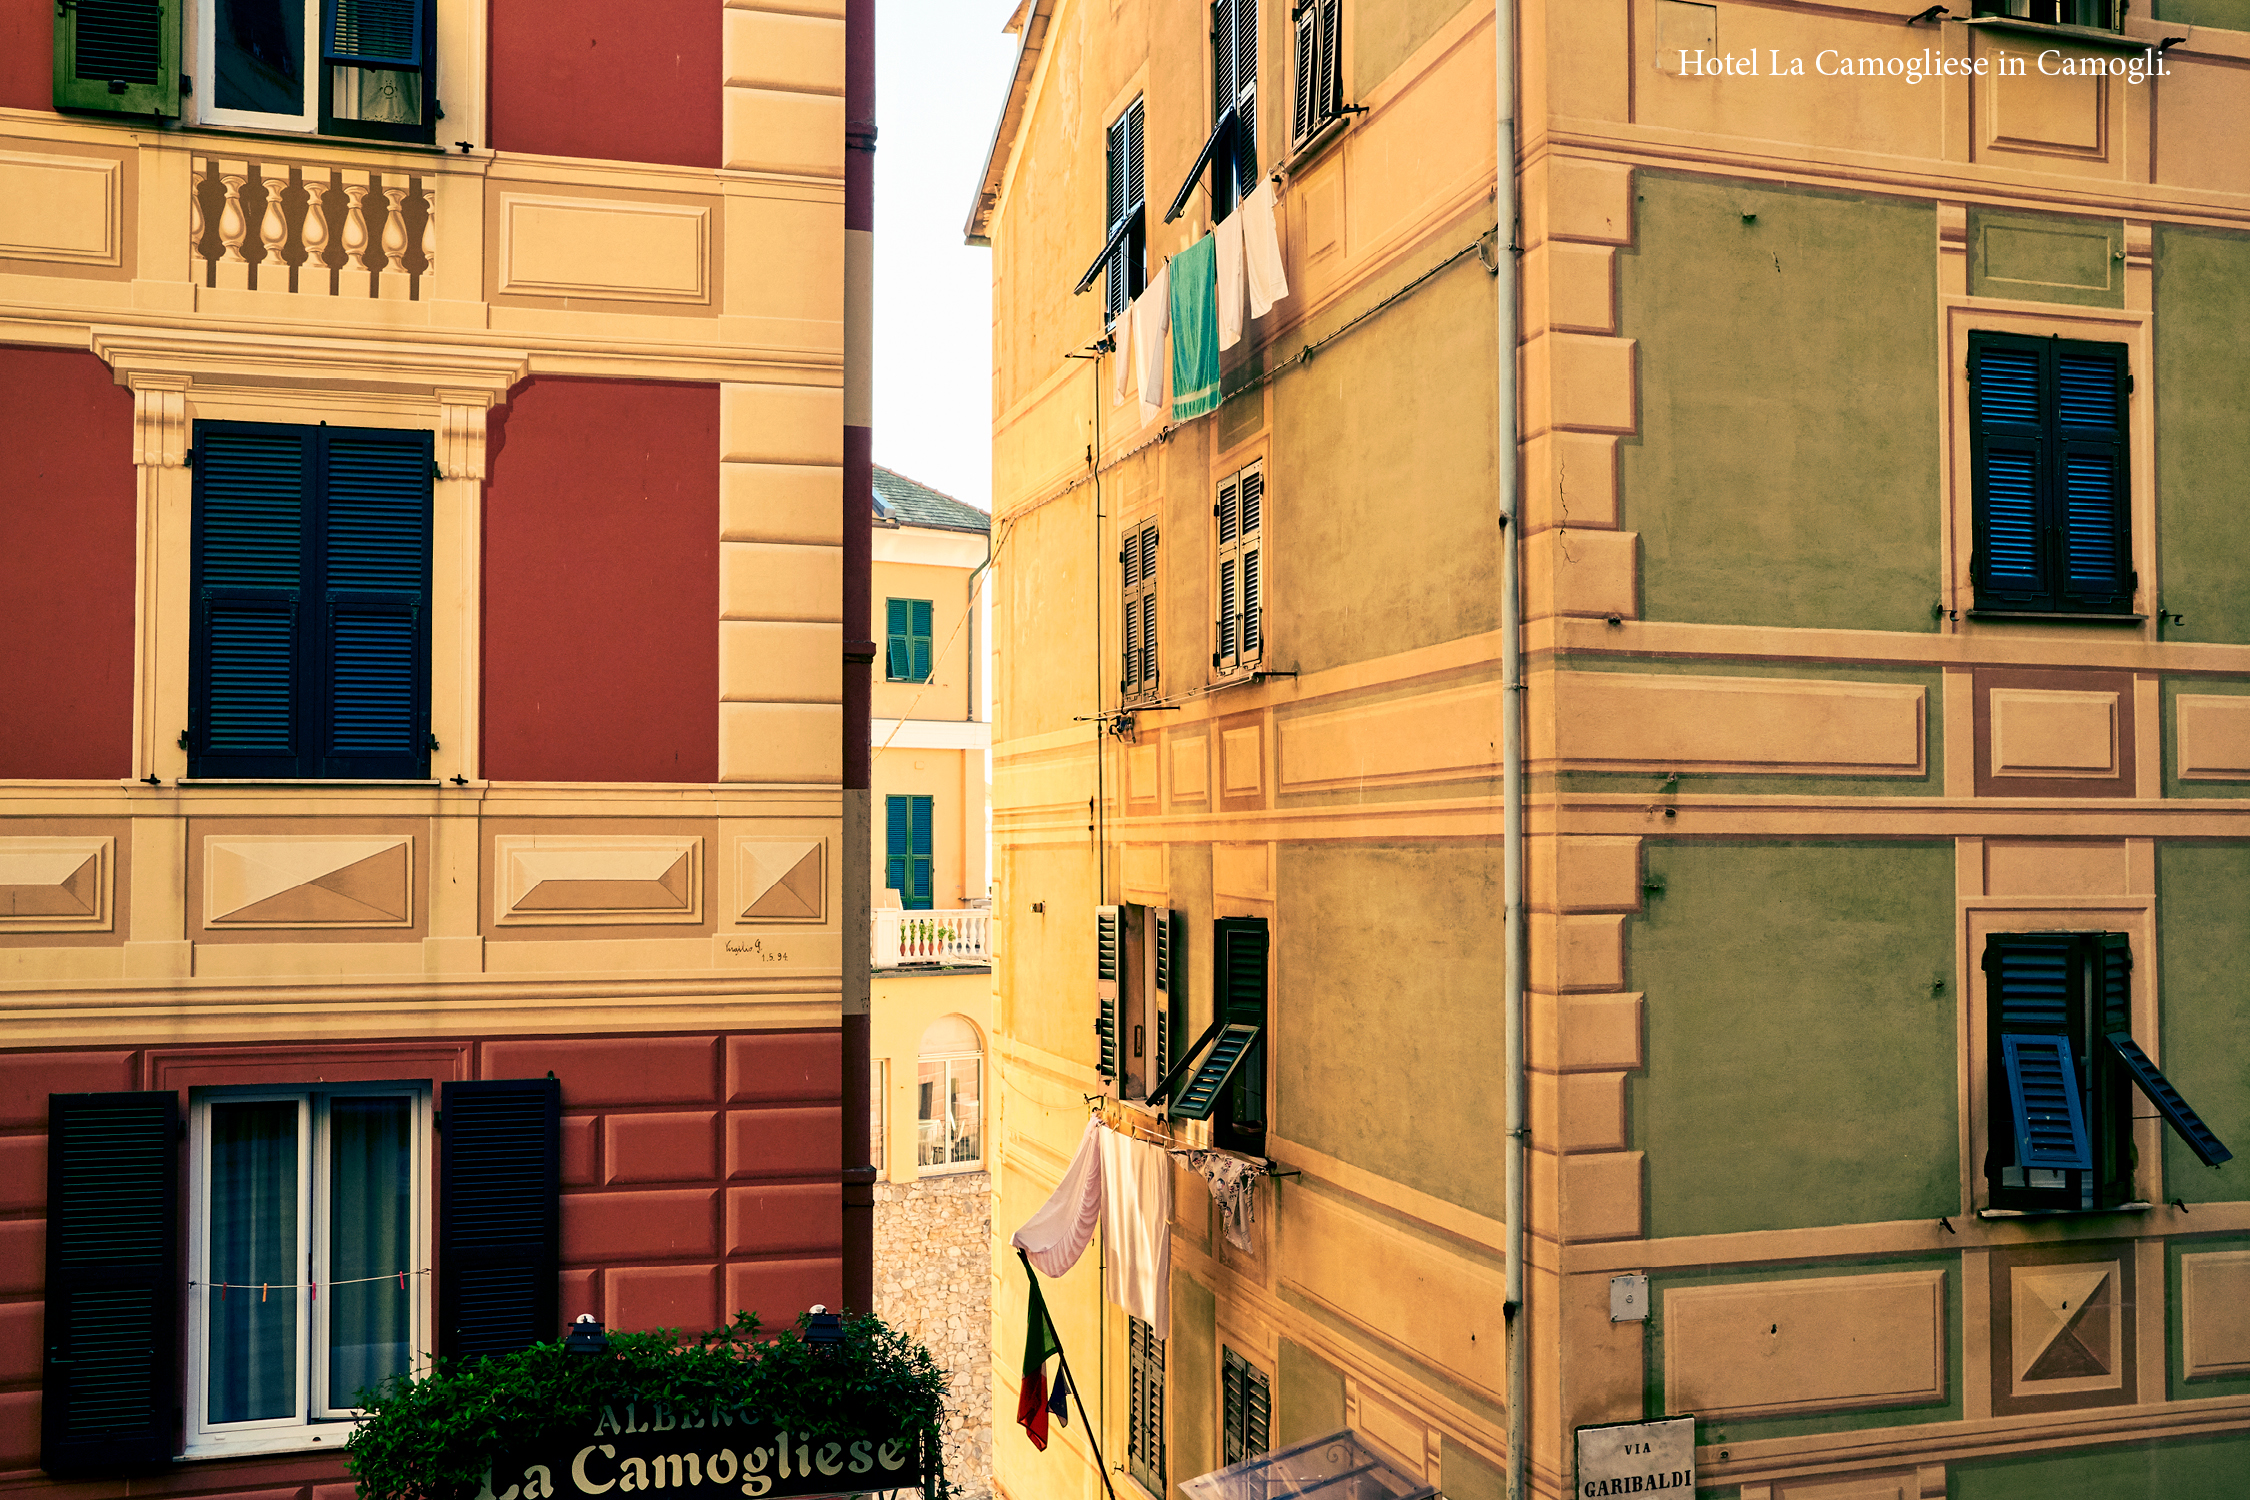 Camogli_ColinClark_Spread_Caption_33.jpg